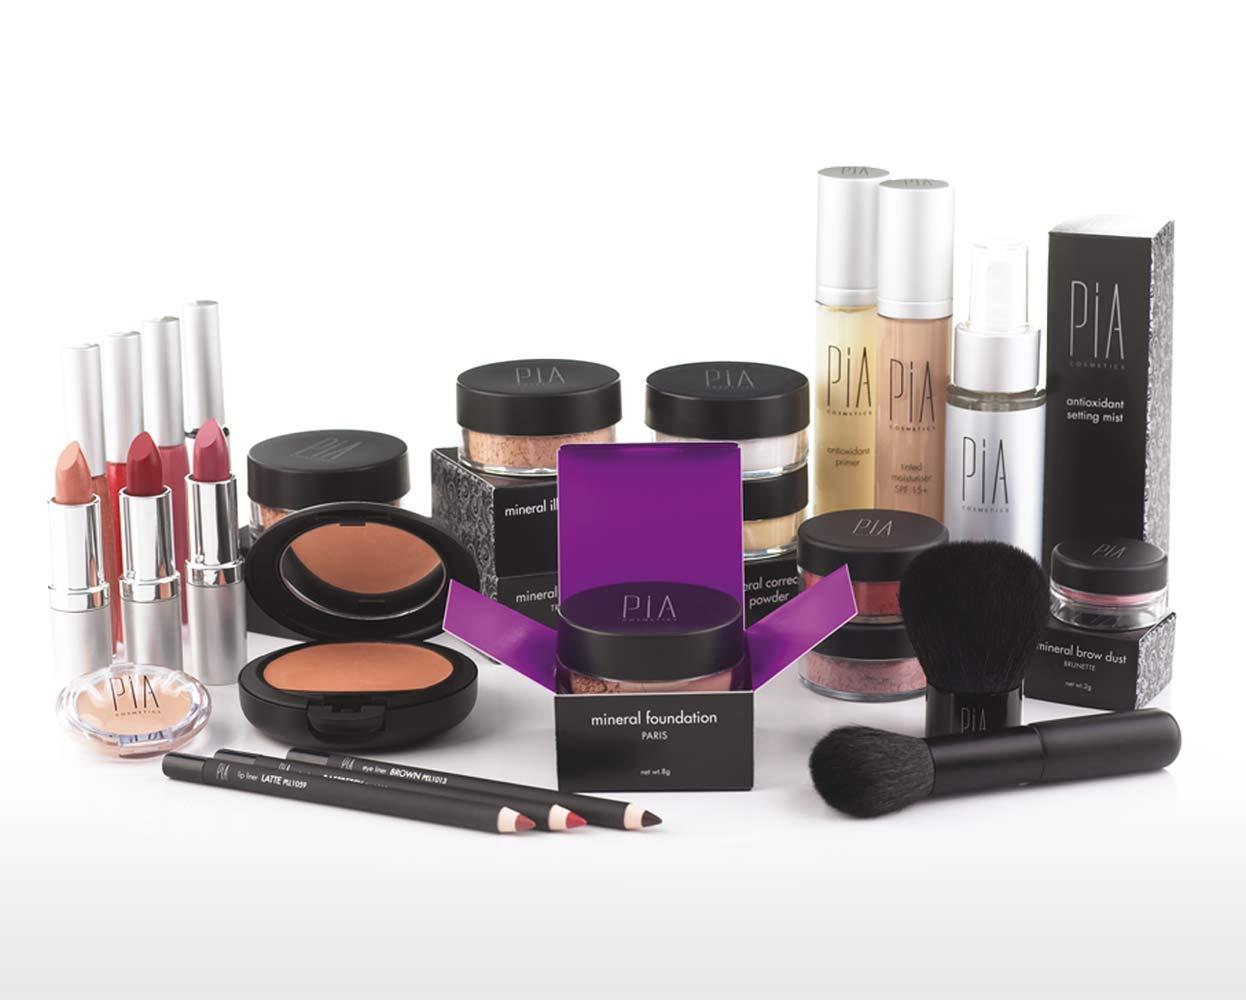 Pia Cosmetics Packaging Cosmetic Range